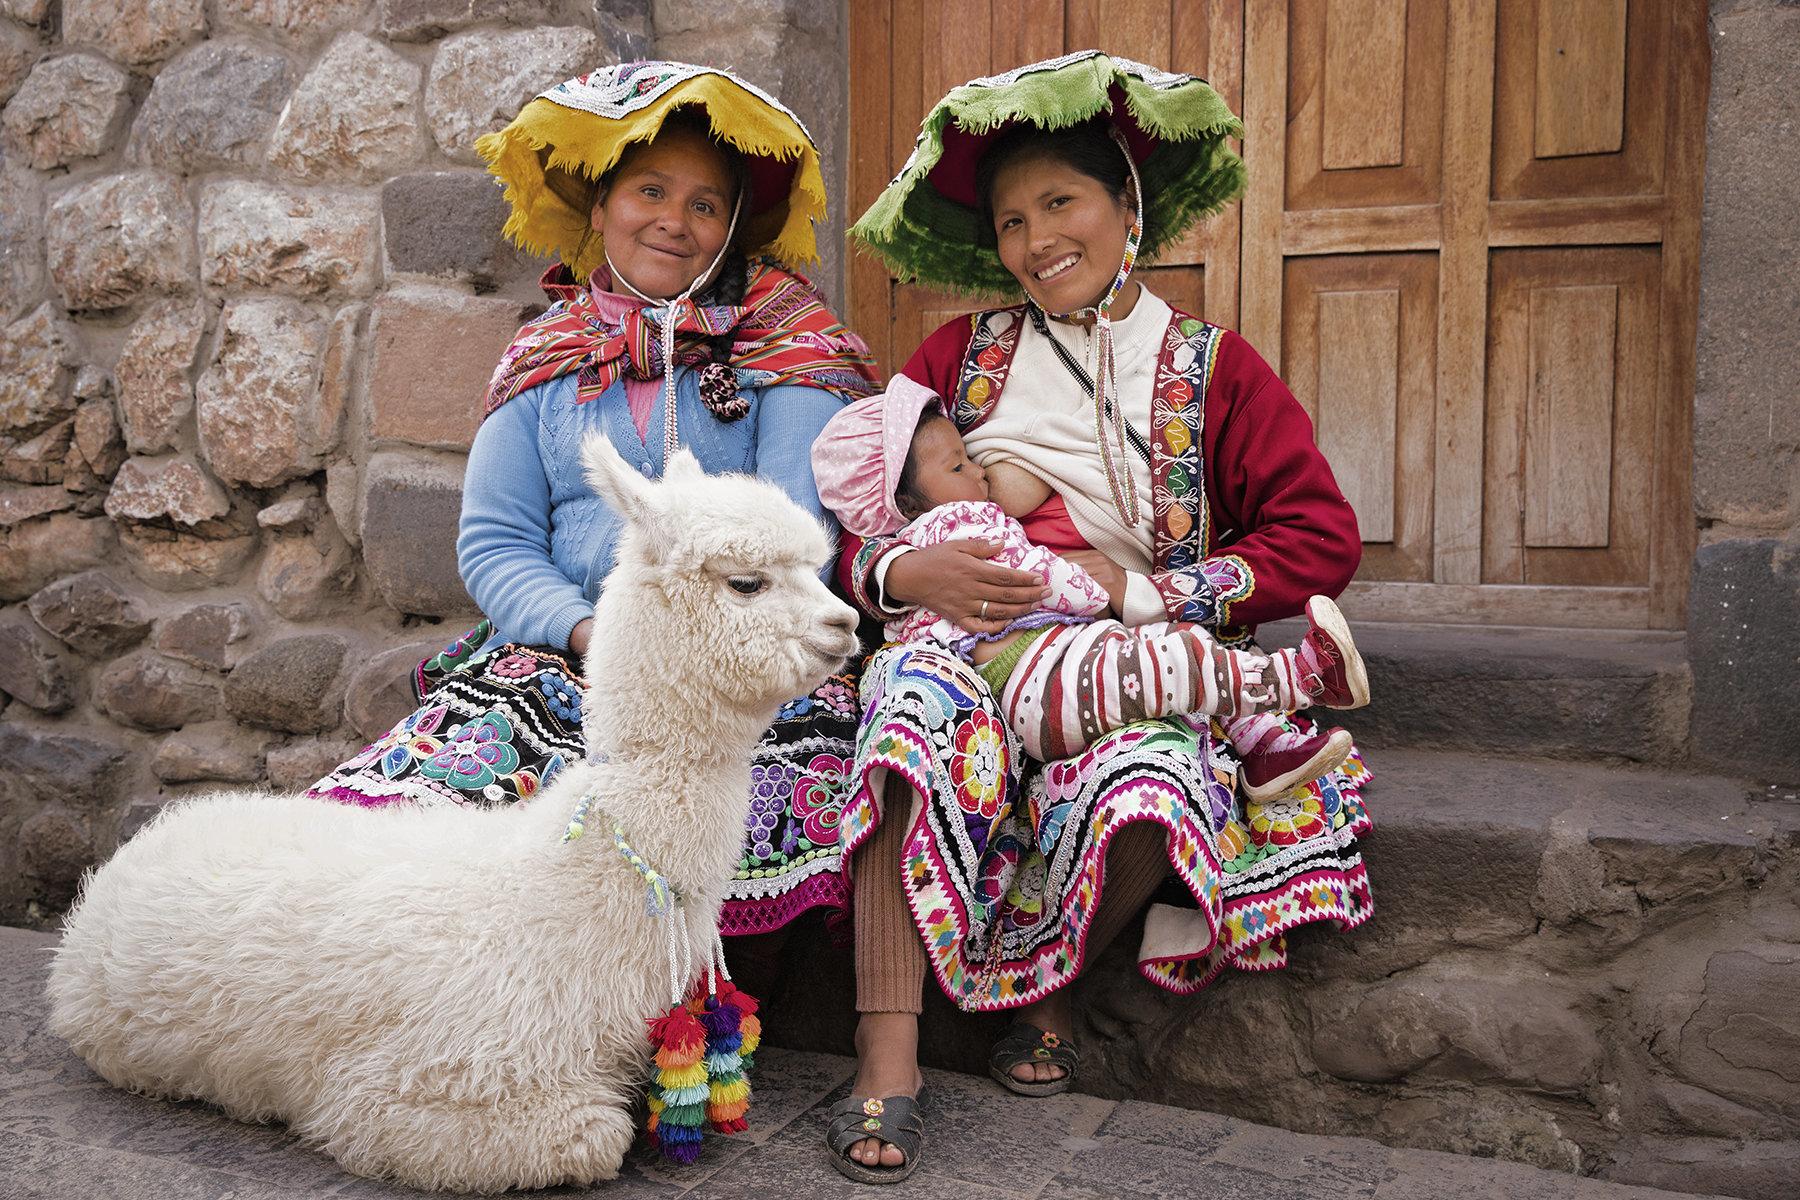 Tina Boyadjieva photographed a woman named Maryluz, her aunt, baby and their llama in Peru.